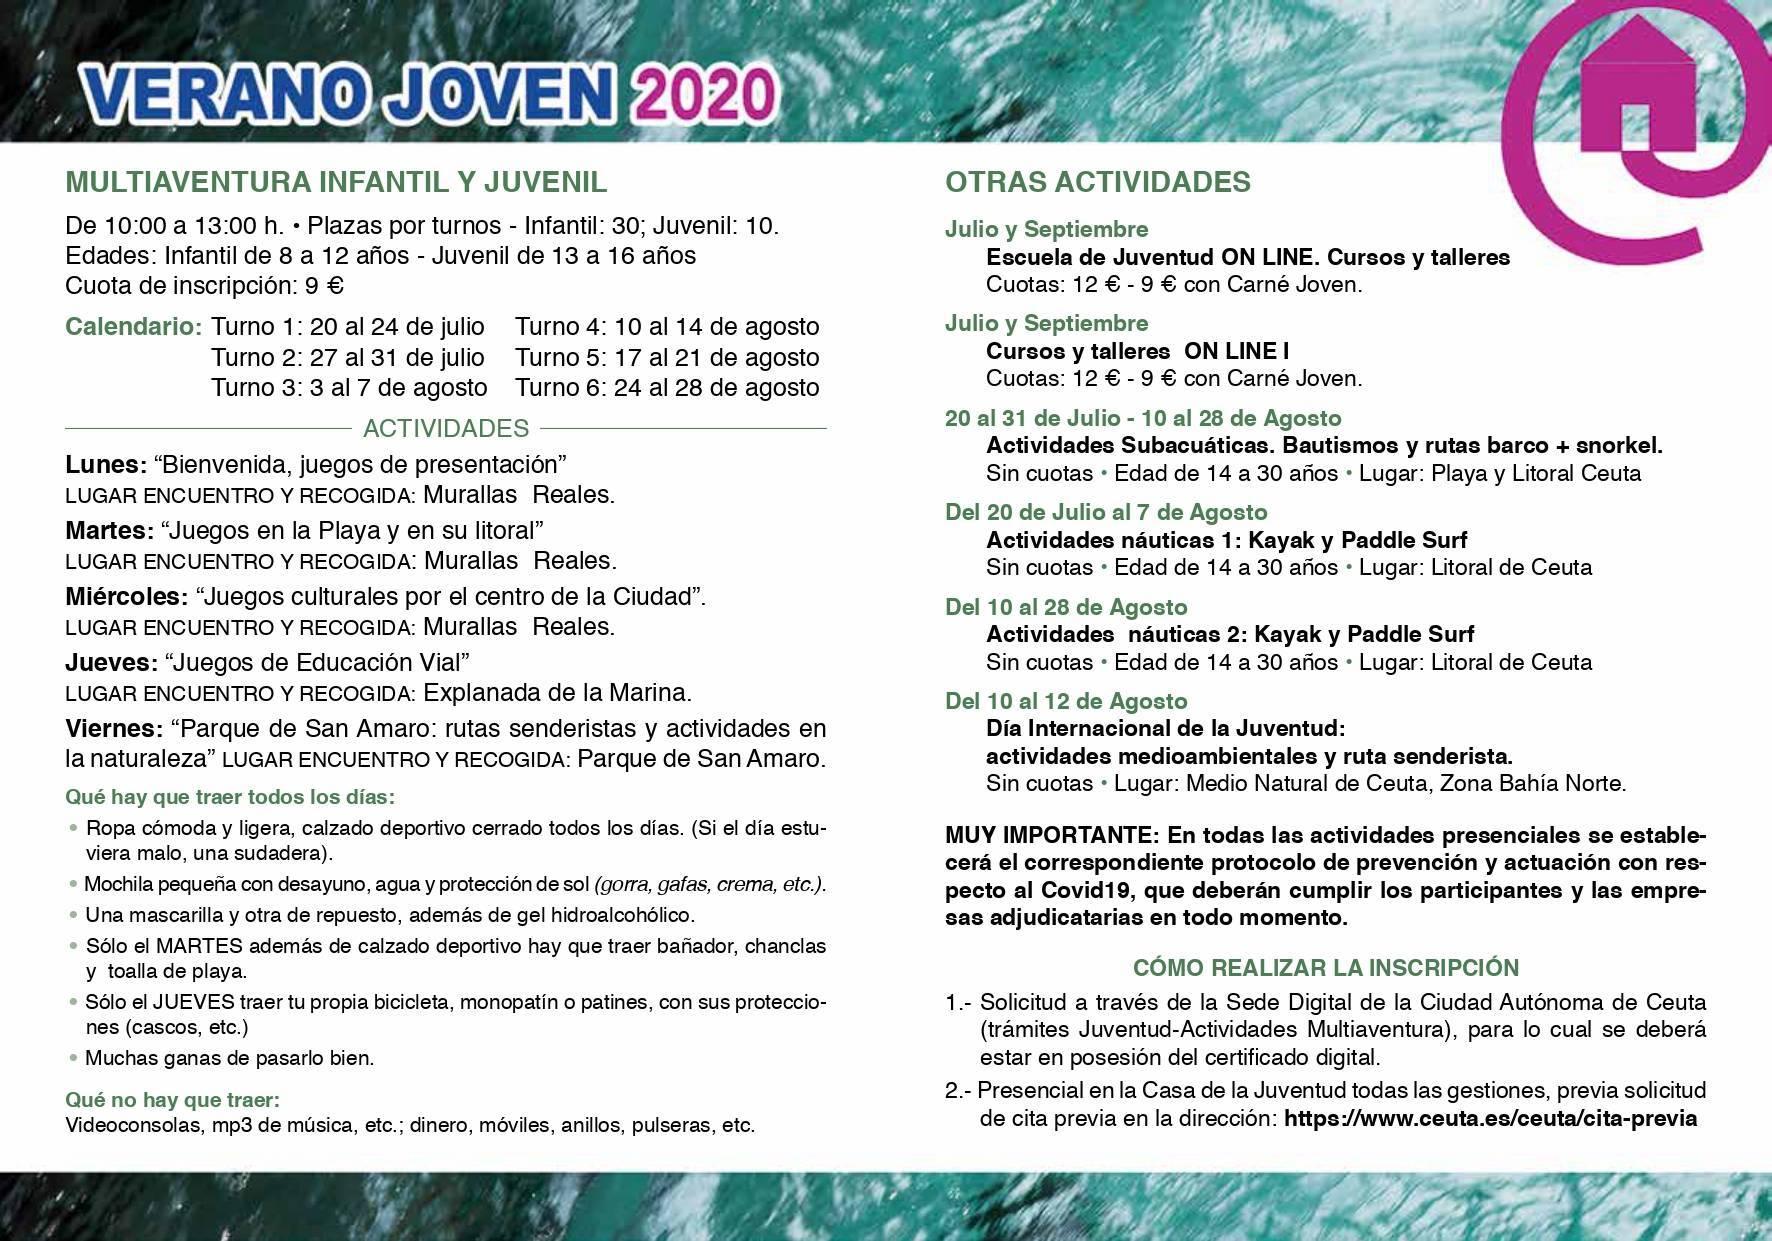 Programa verano joven 2020 - Ceuta 2